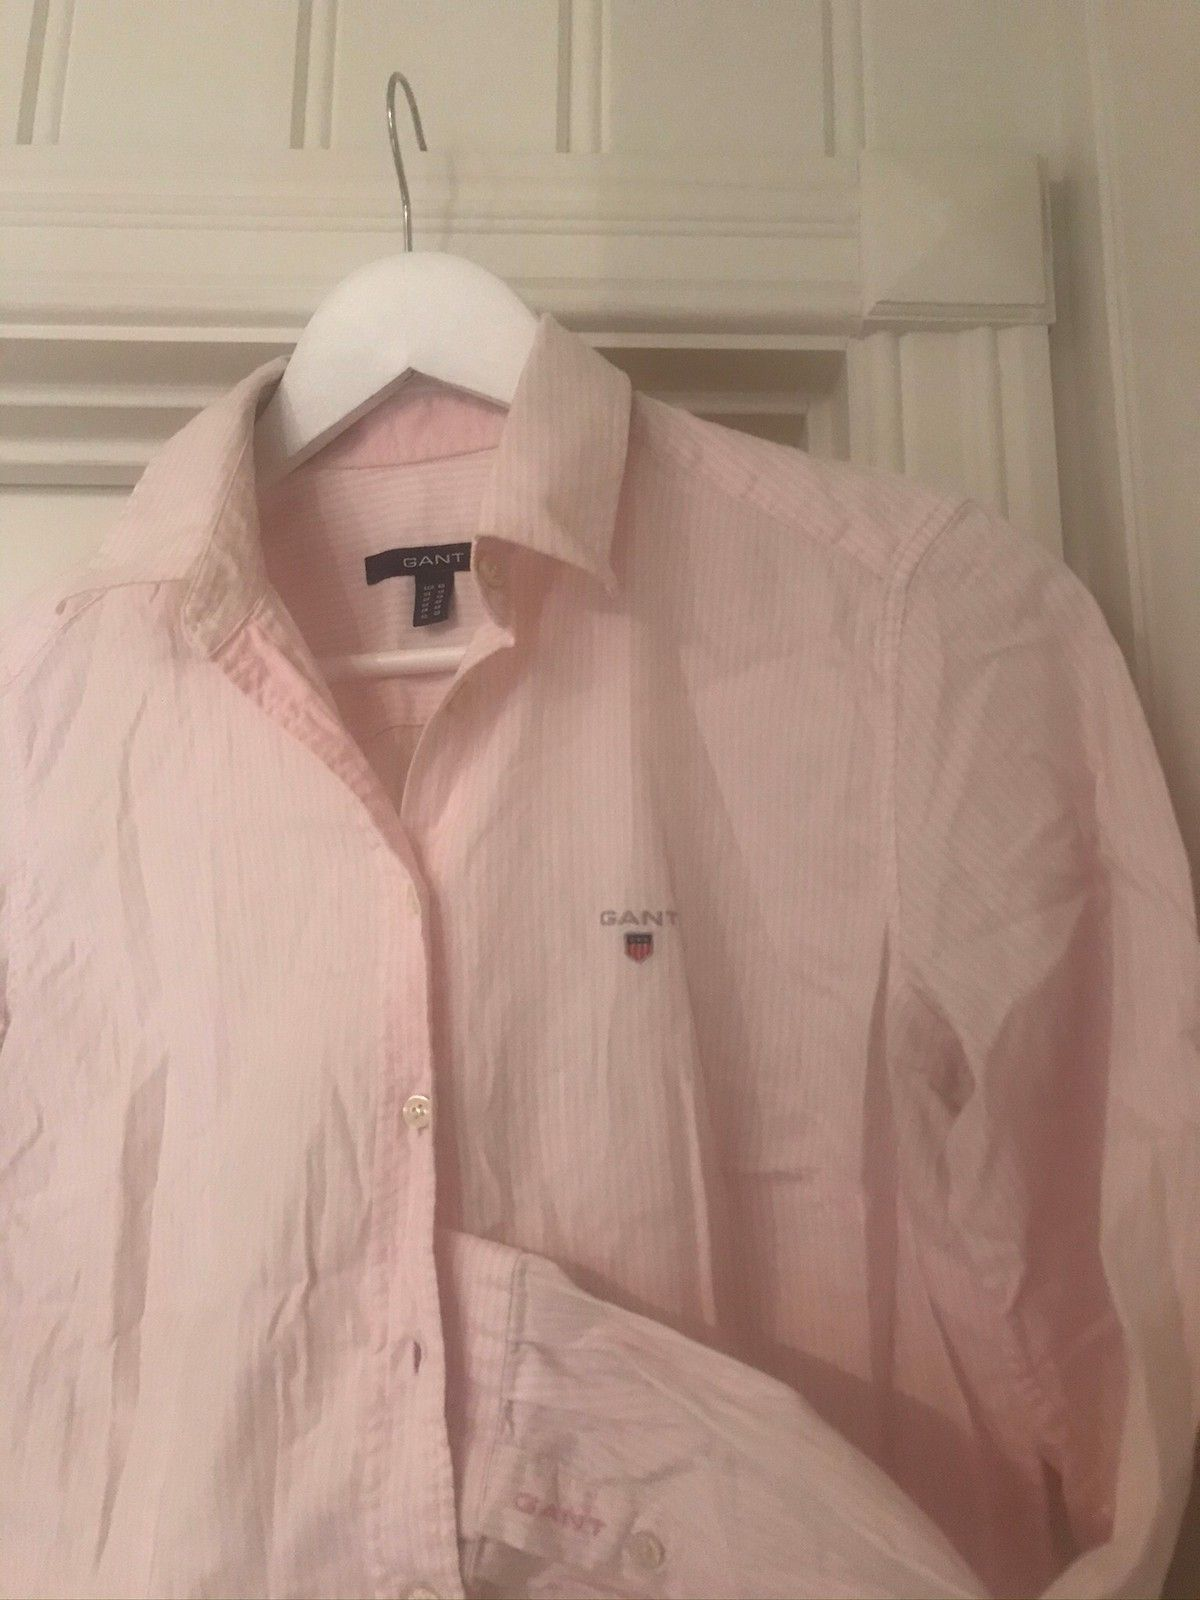 Fin Gant skjorte   FINN.no